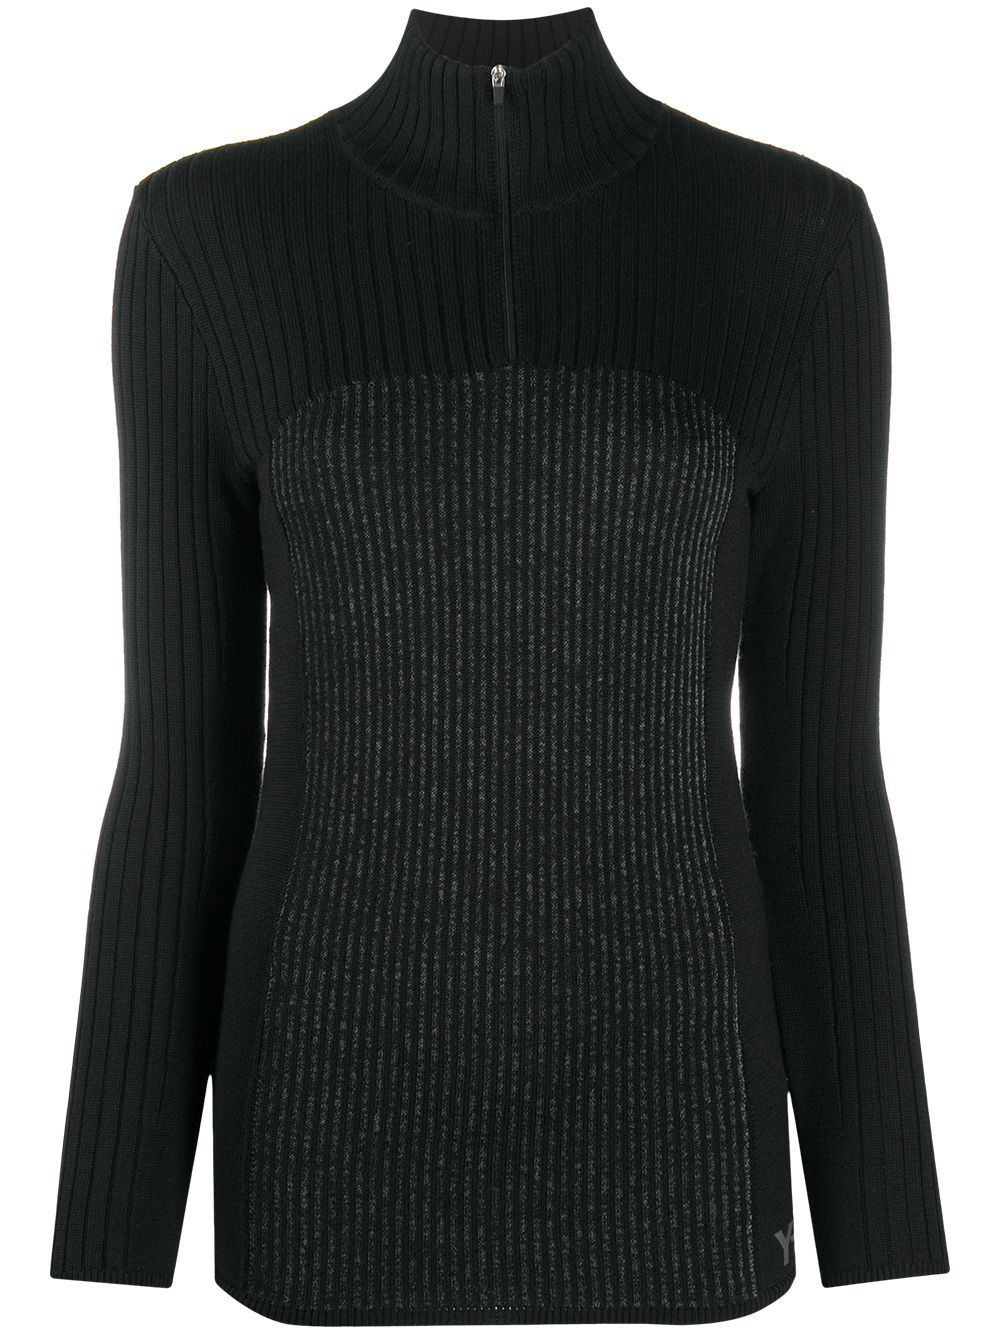 Wool Reflective Sweater